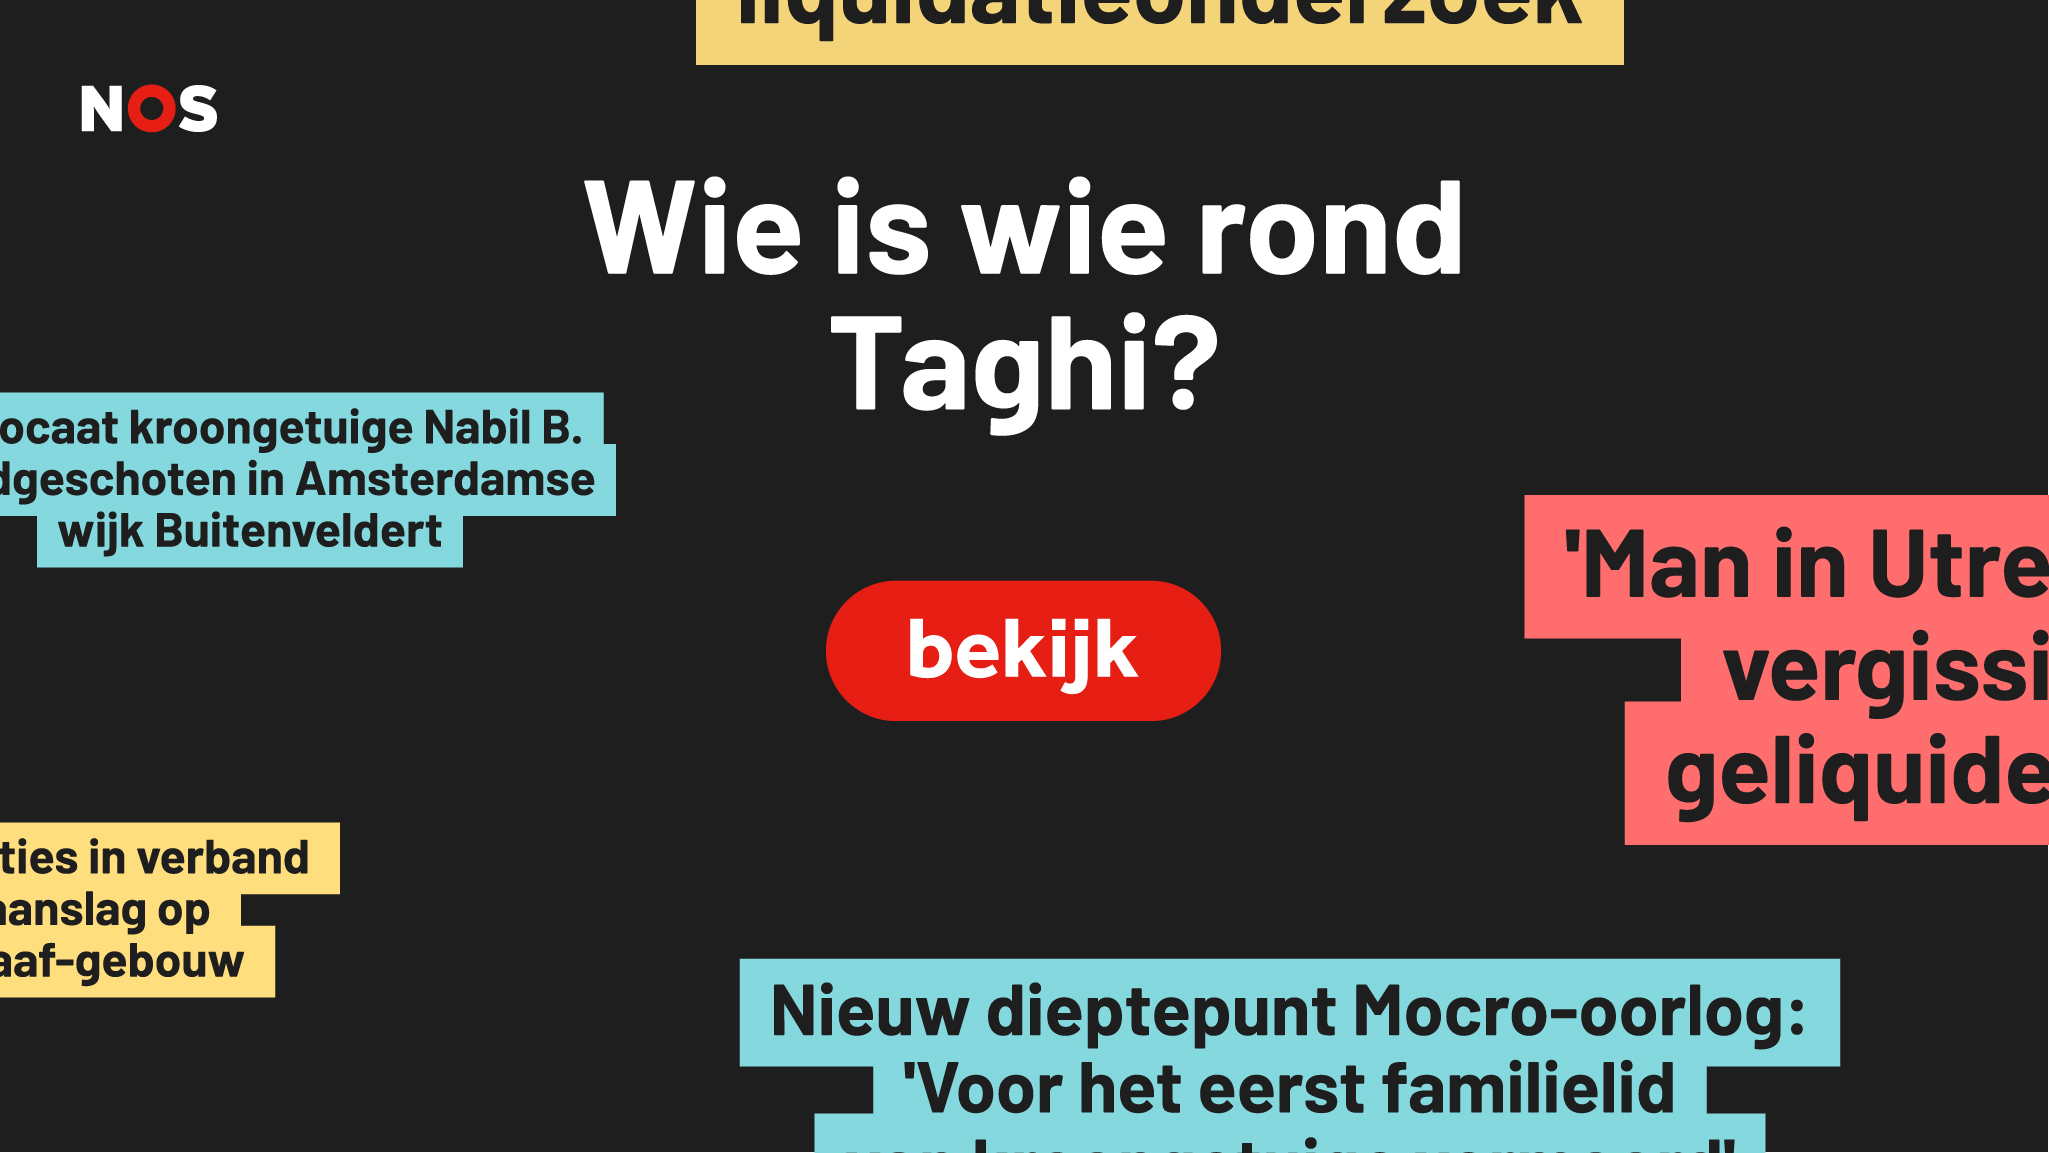 Wie is wie rond Taghi?